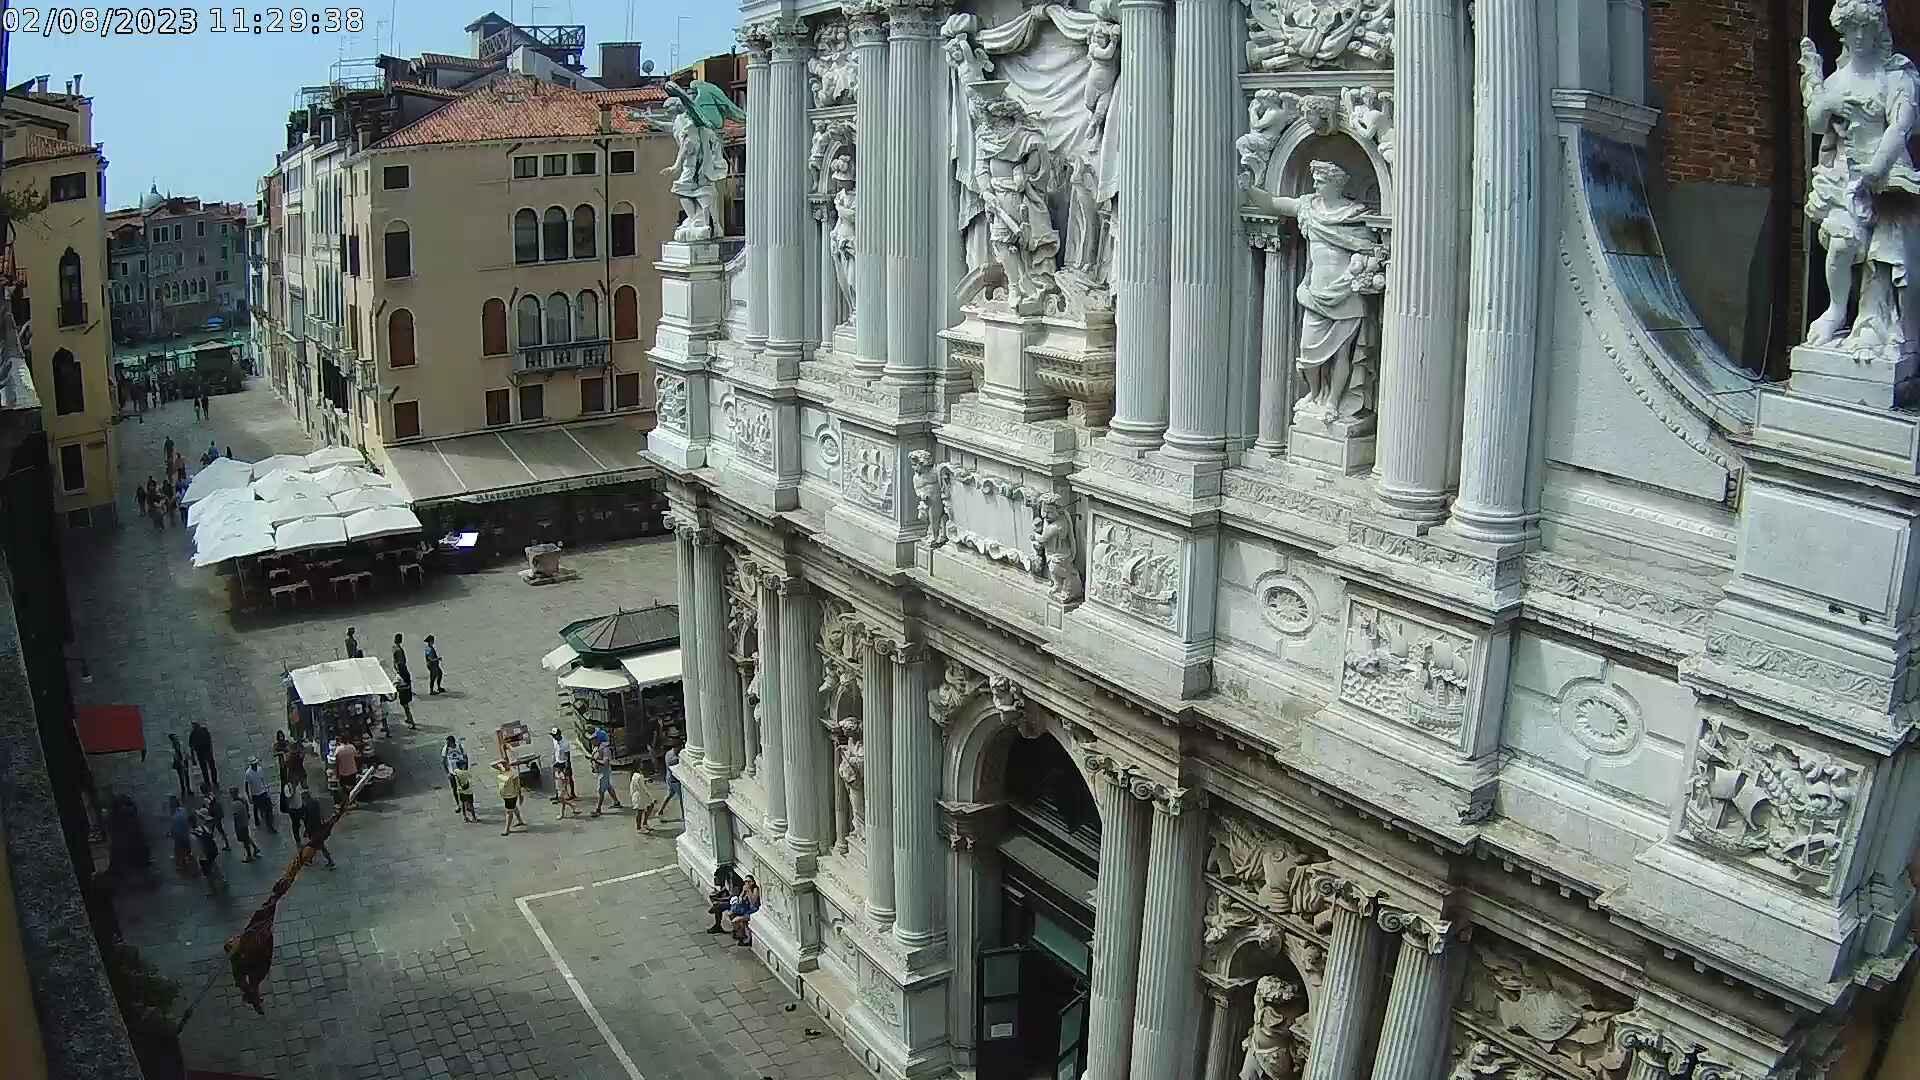 Venedig Sa. 11:30